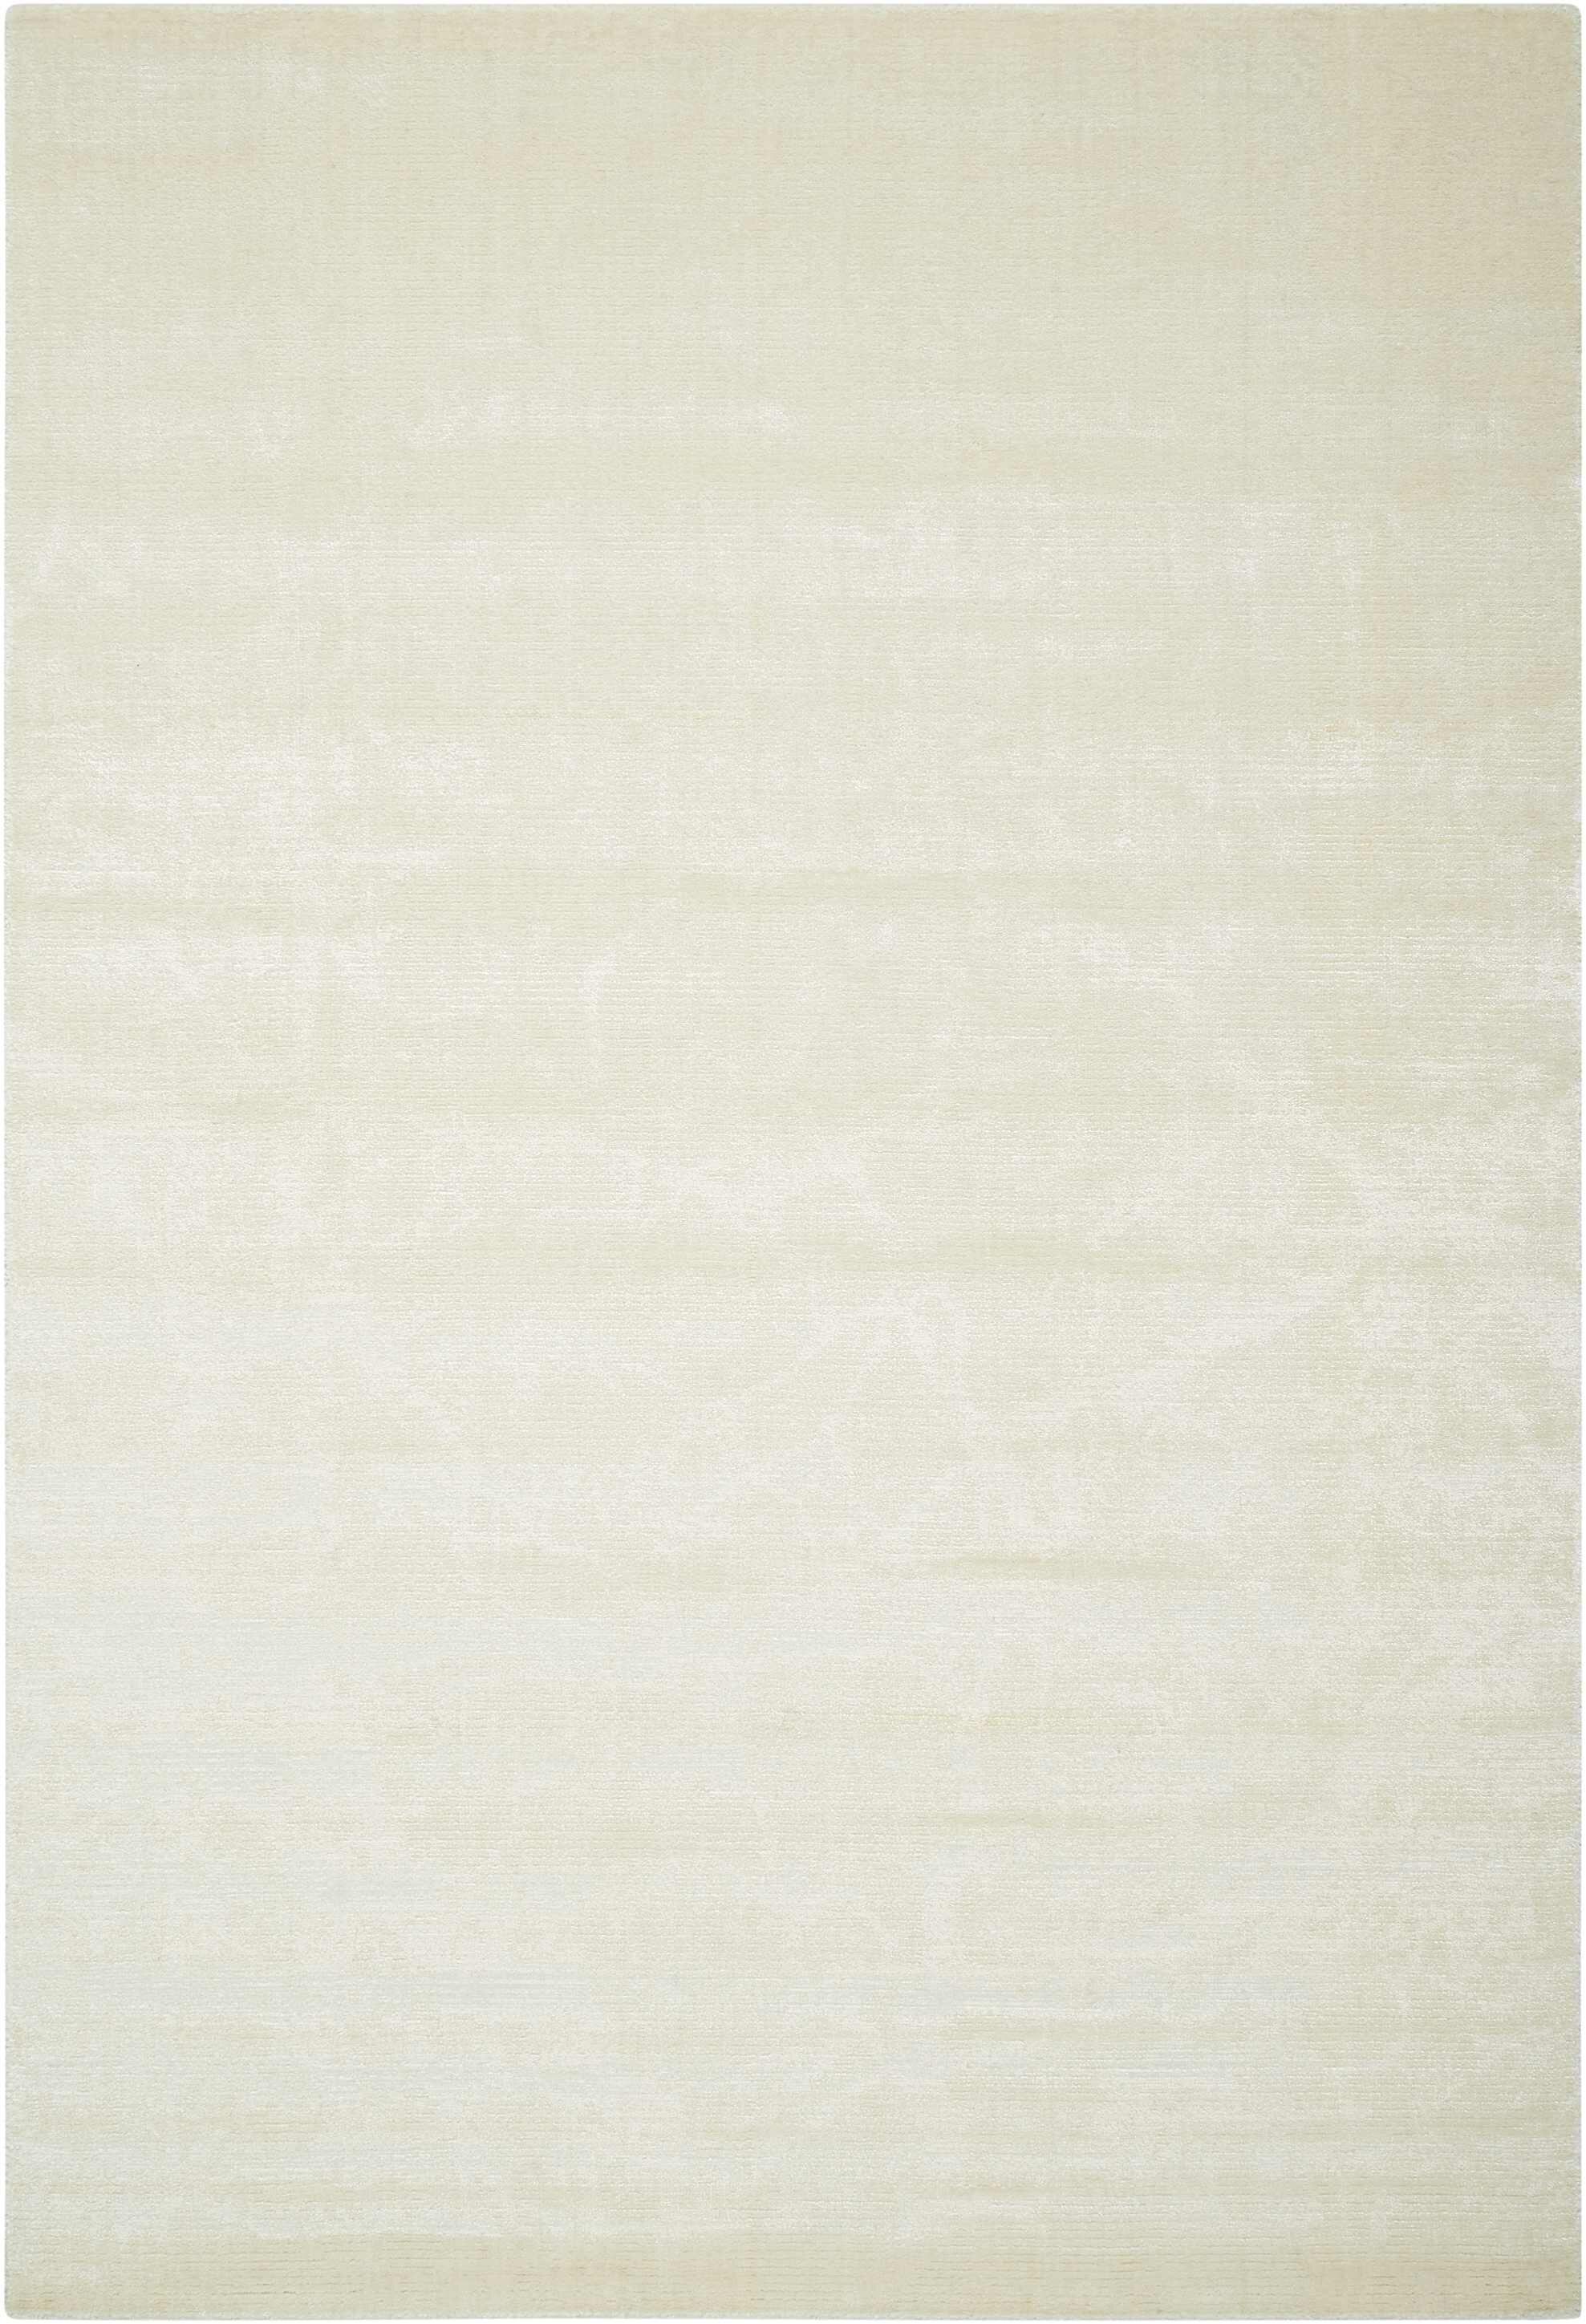 Arabelle Solid Ivory Area Rug Rug Size: Rectangle 12' x 15'